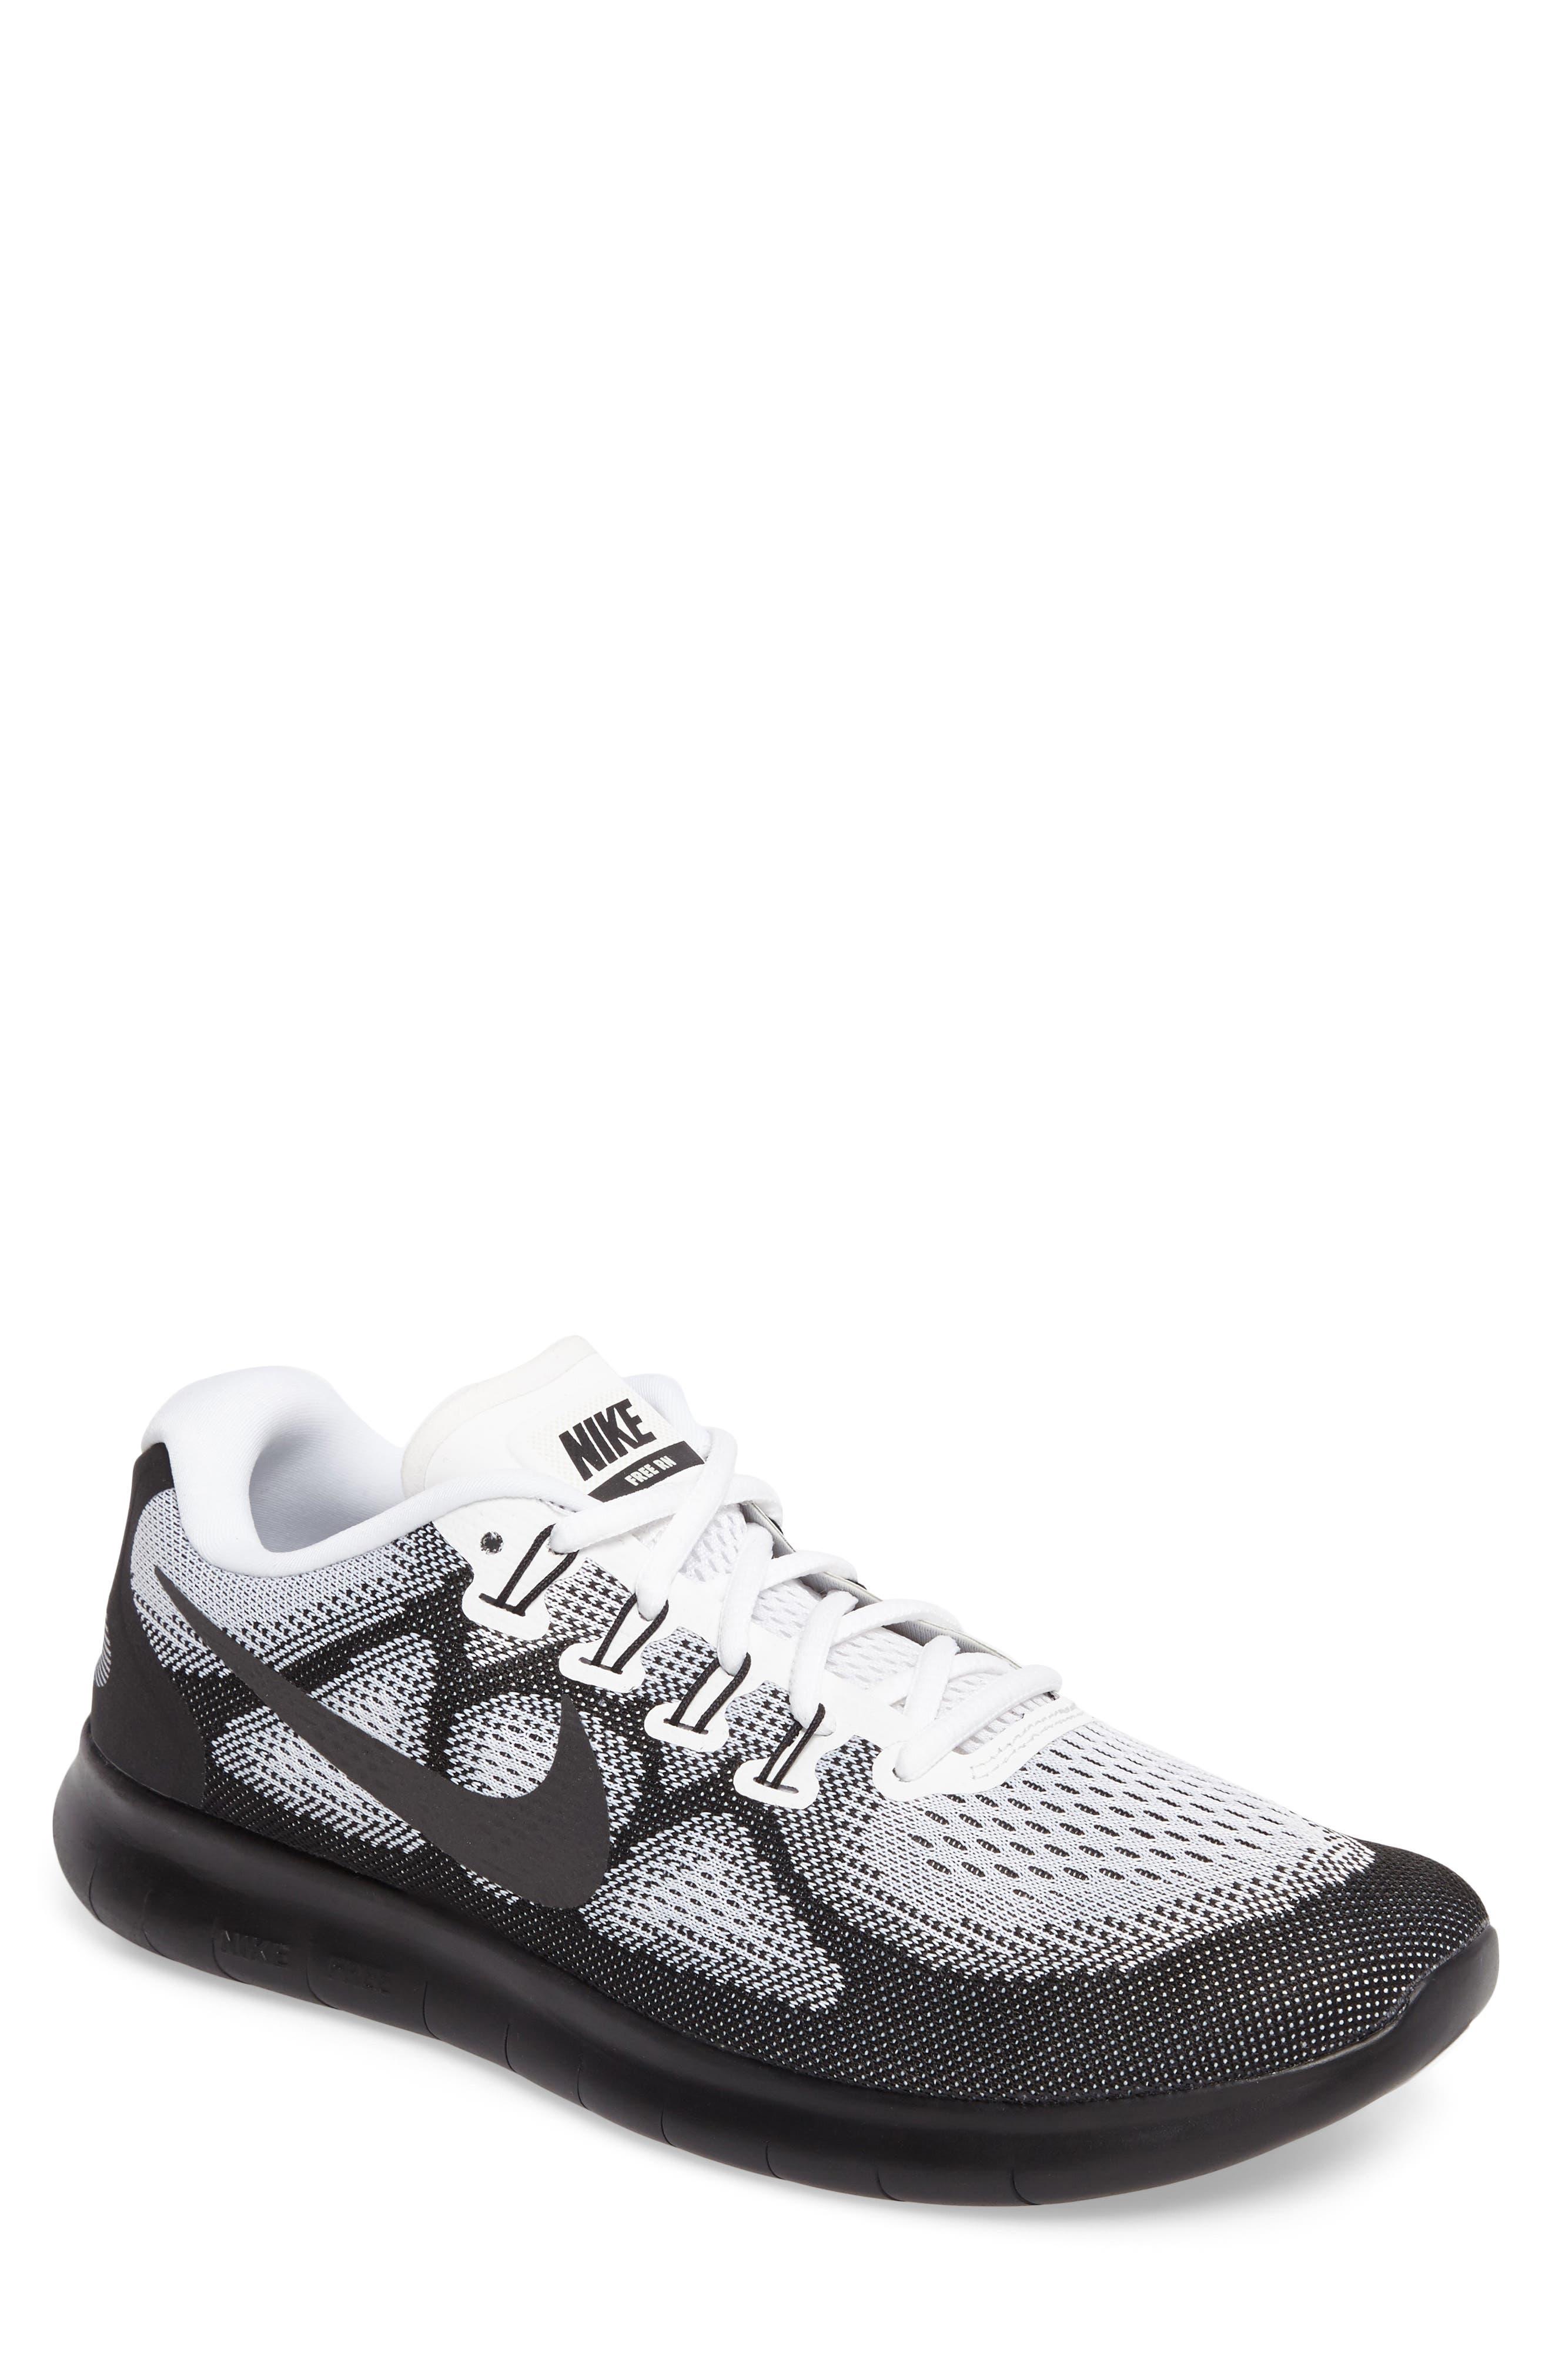 Free RN 2017 LE Running Shoe,                             Main thumbnail 1, color,                             002